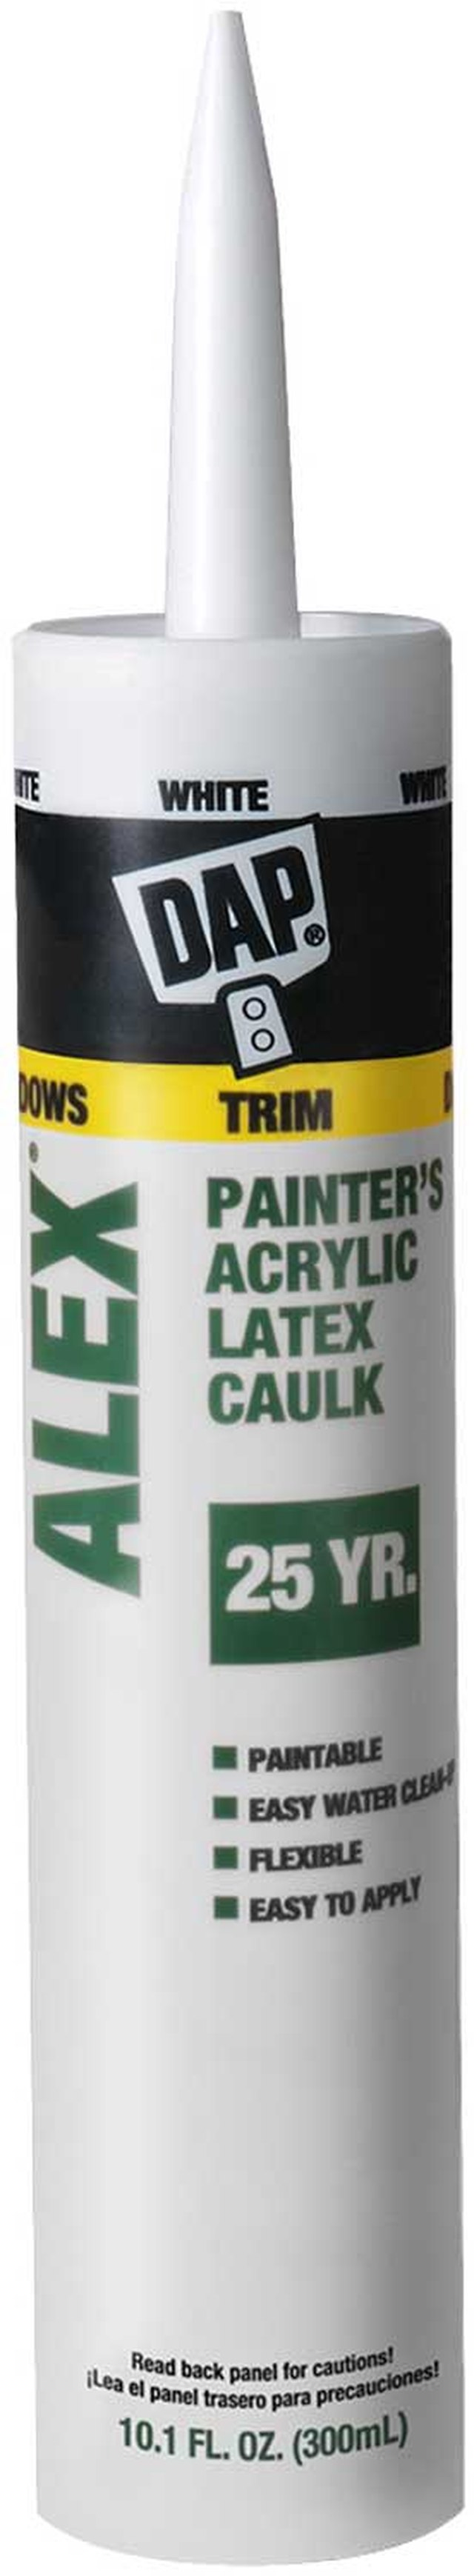 acrylic painter's caulk